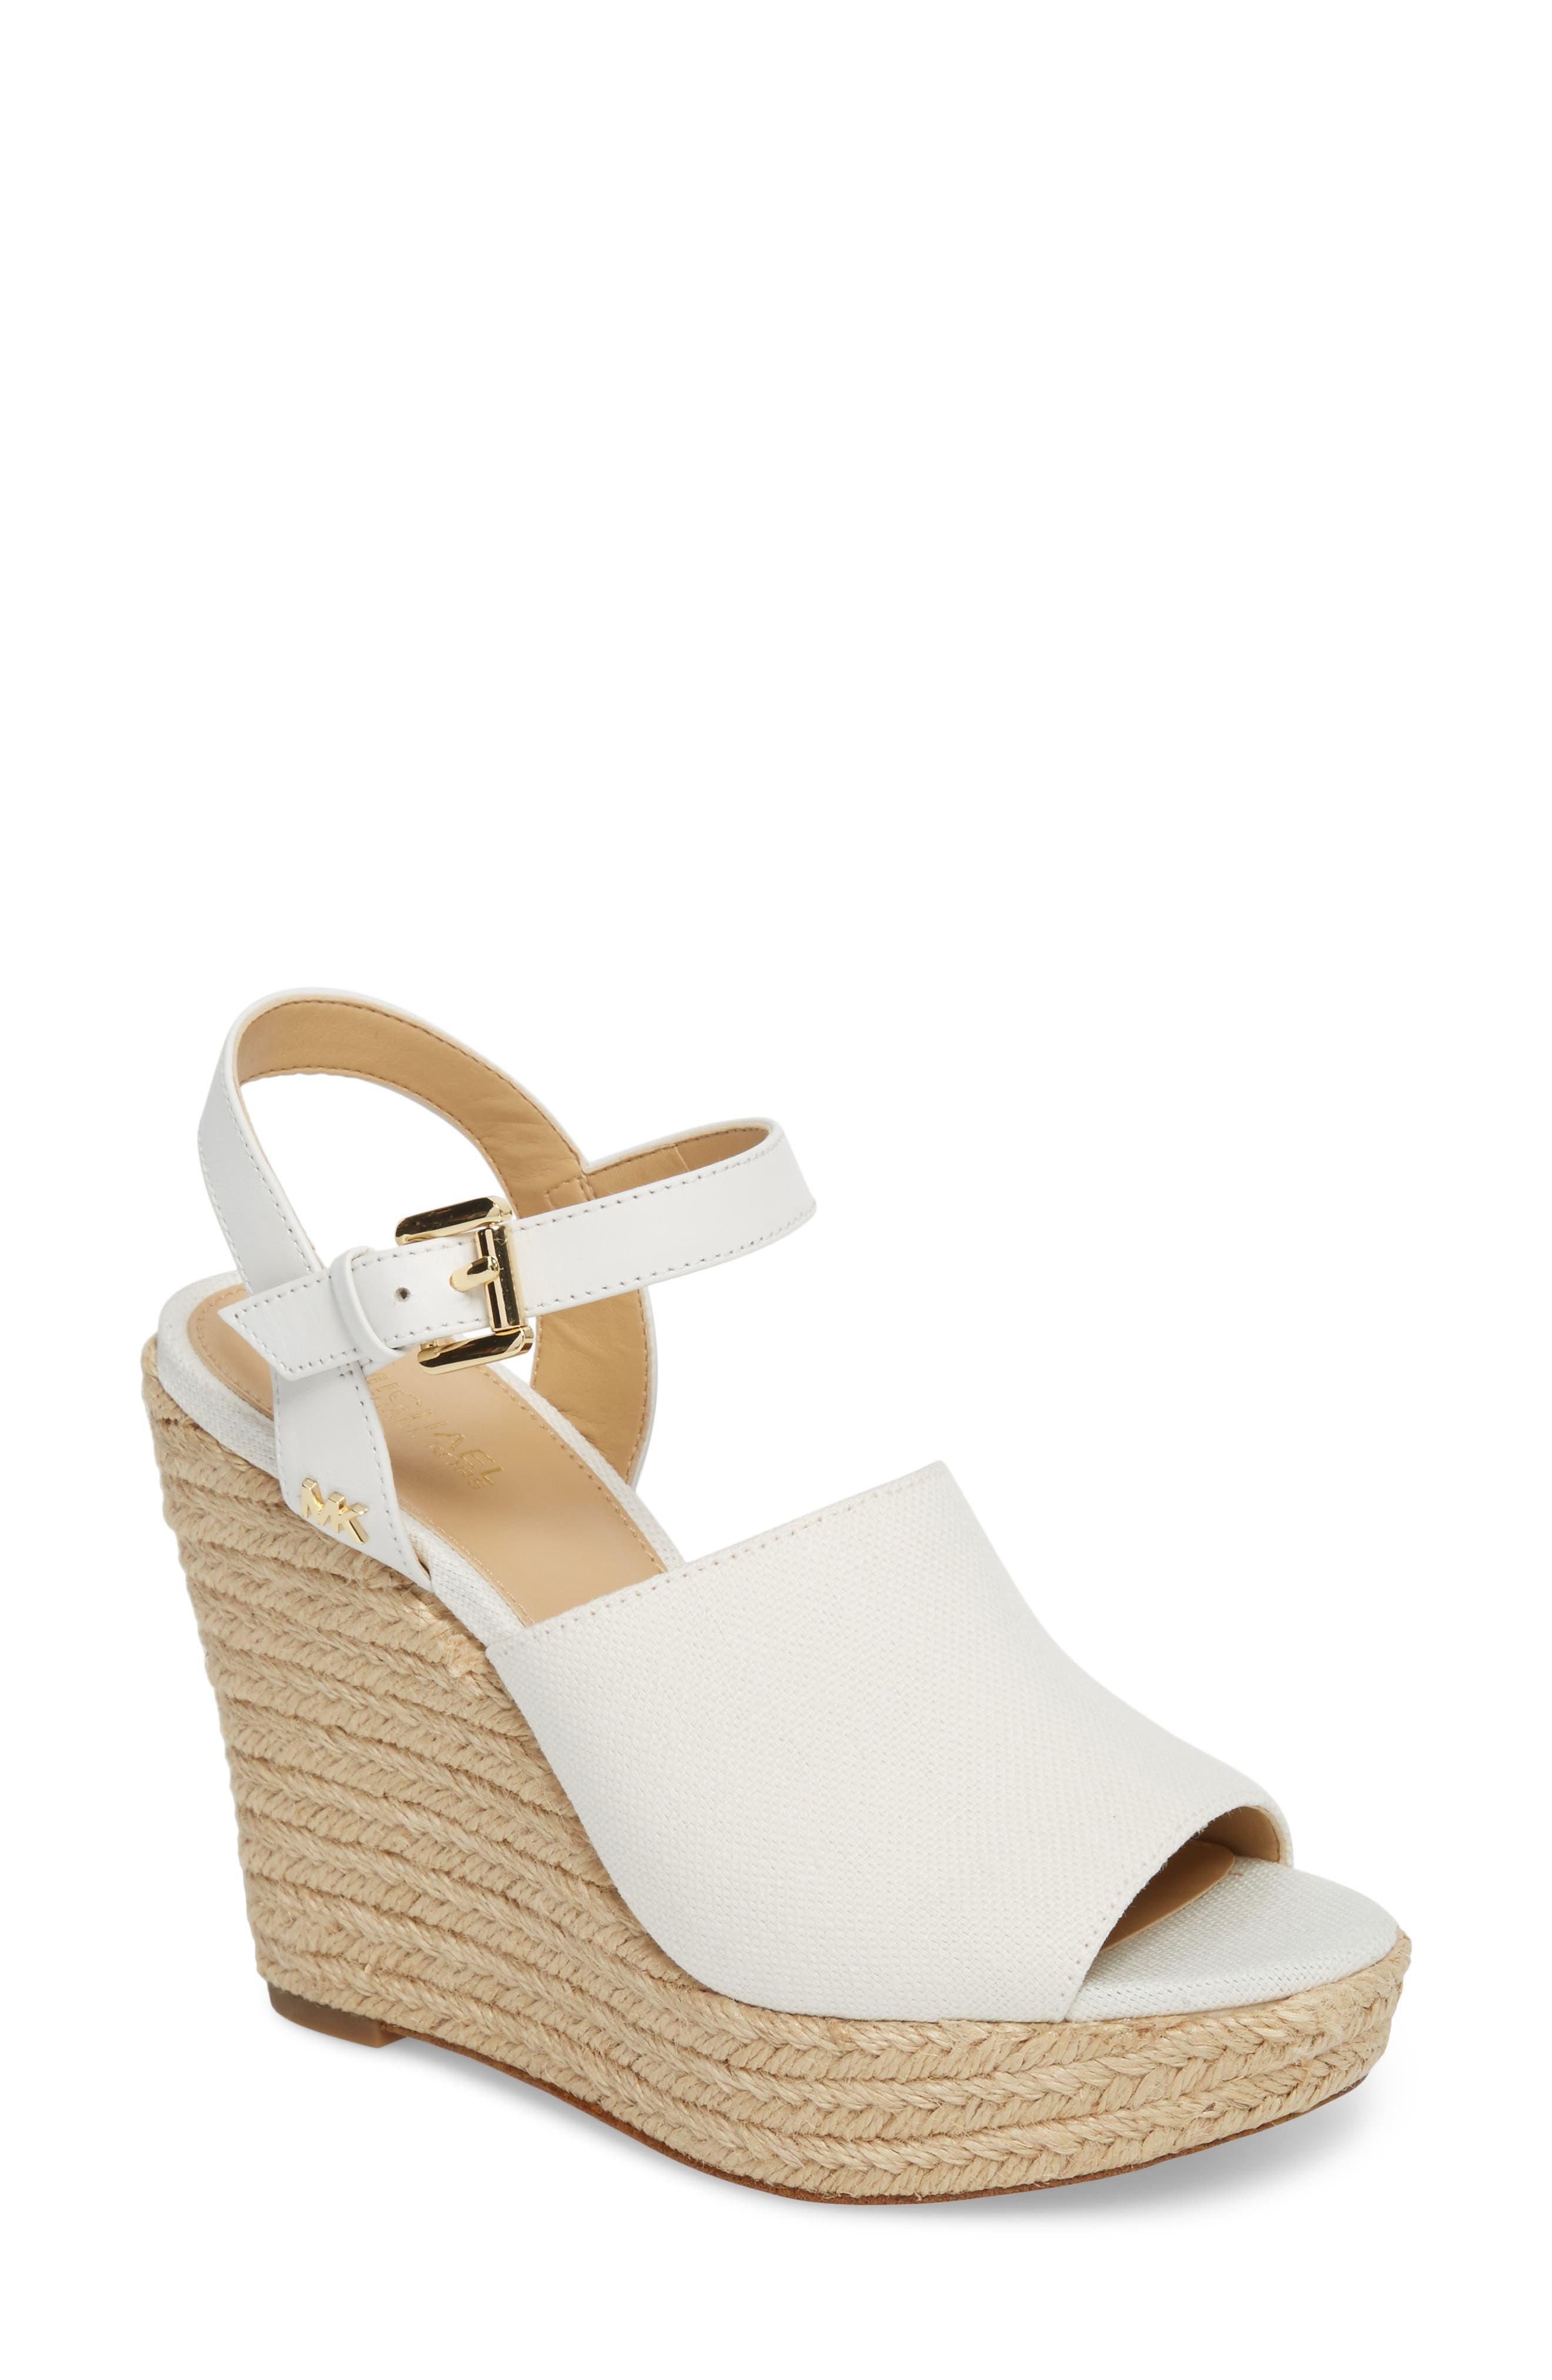 Penelope Espadrille Wedge Sandal,                         Main,                         color, Optic White Canvas